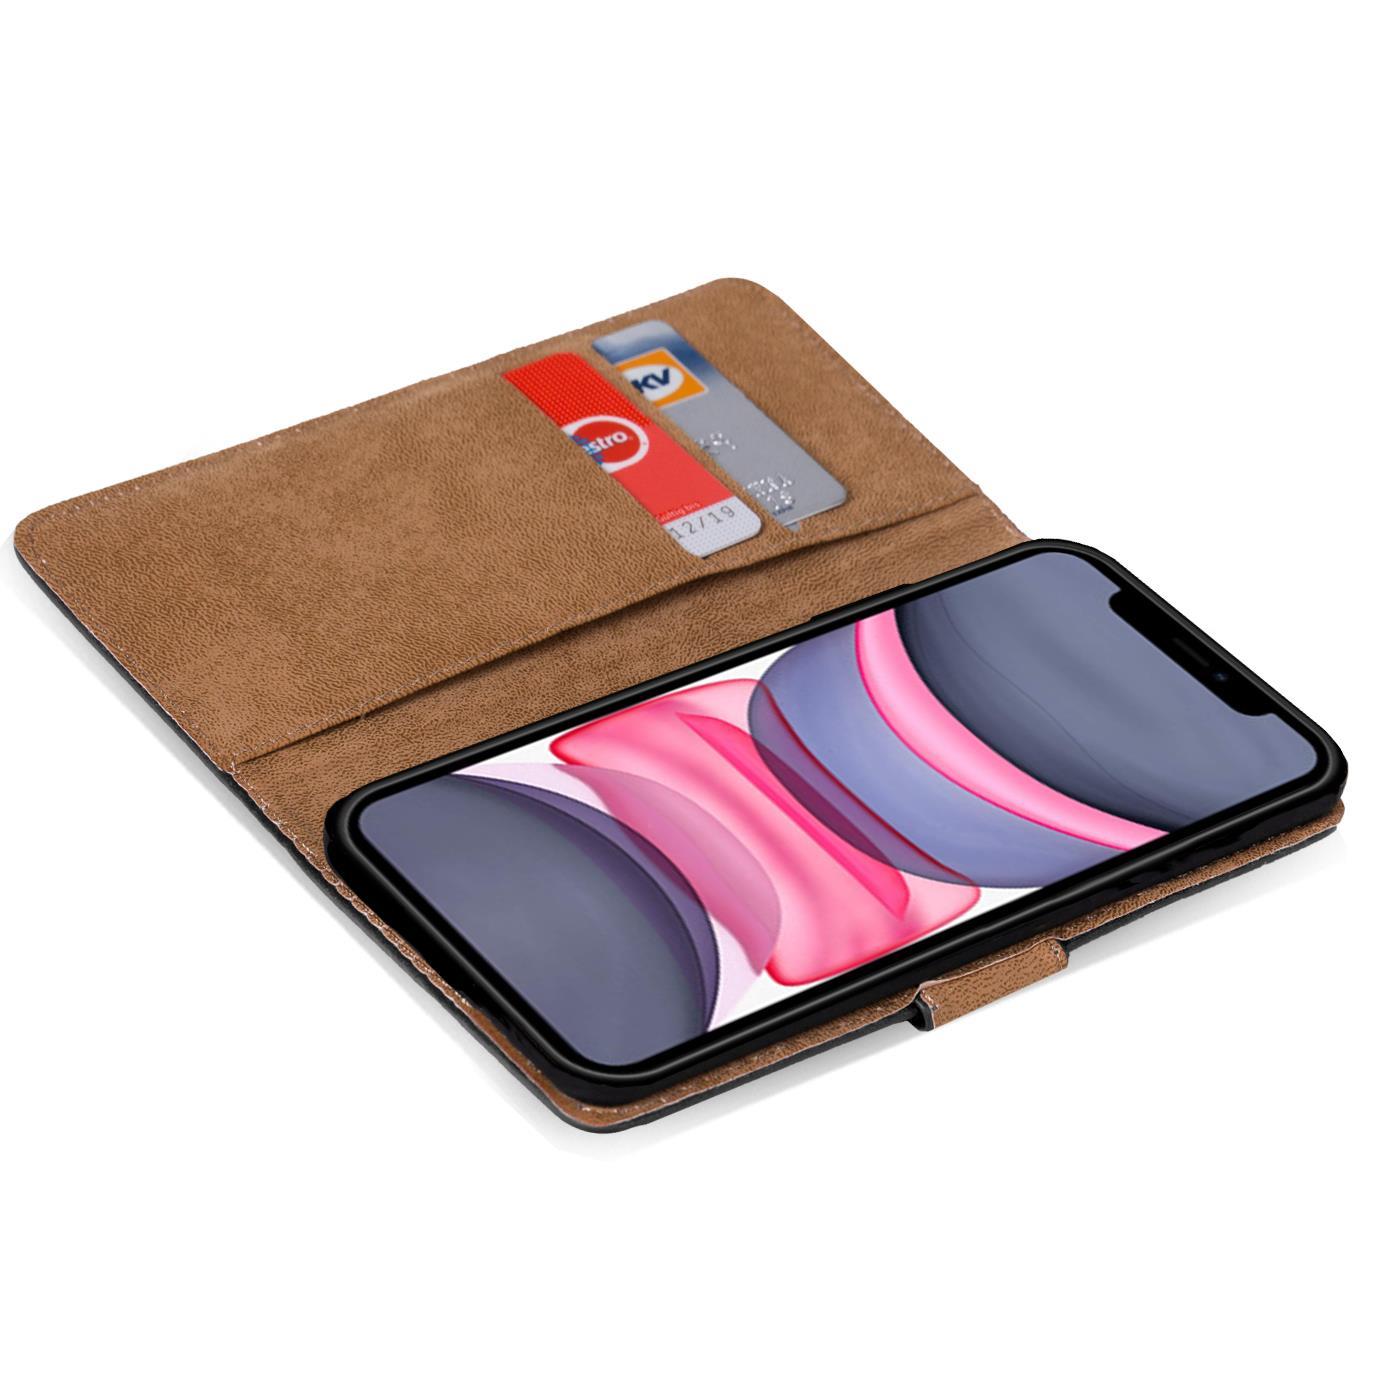 Schutzhülle Apple iPhone Etui Tasche Slim Cover PU Leder Book Case Klapp Hülle